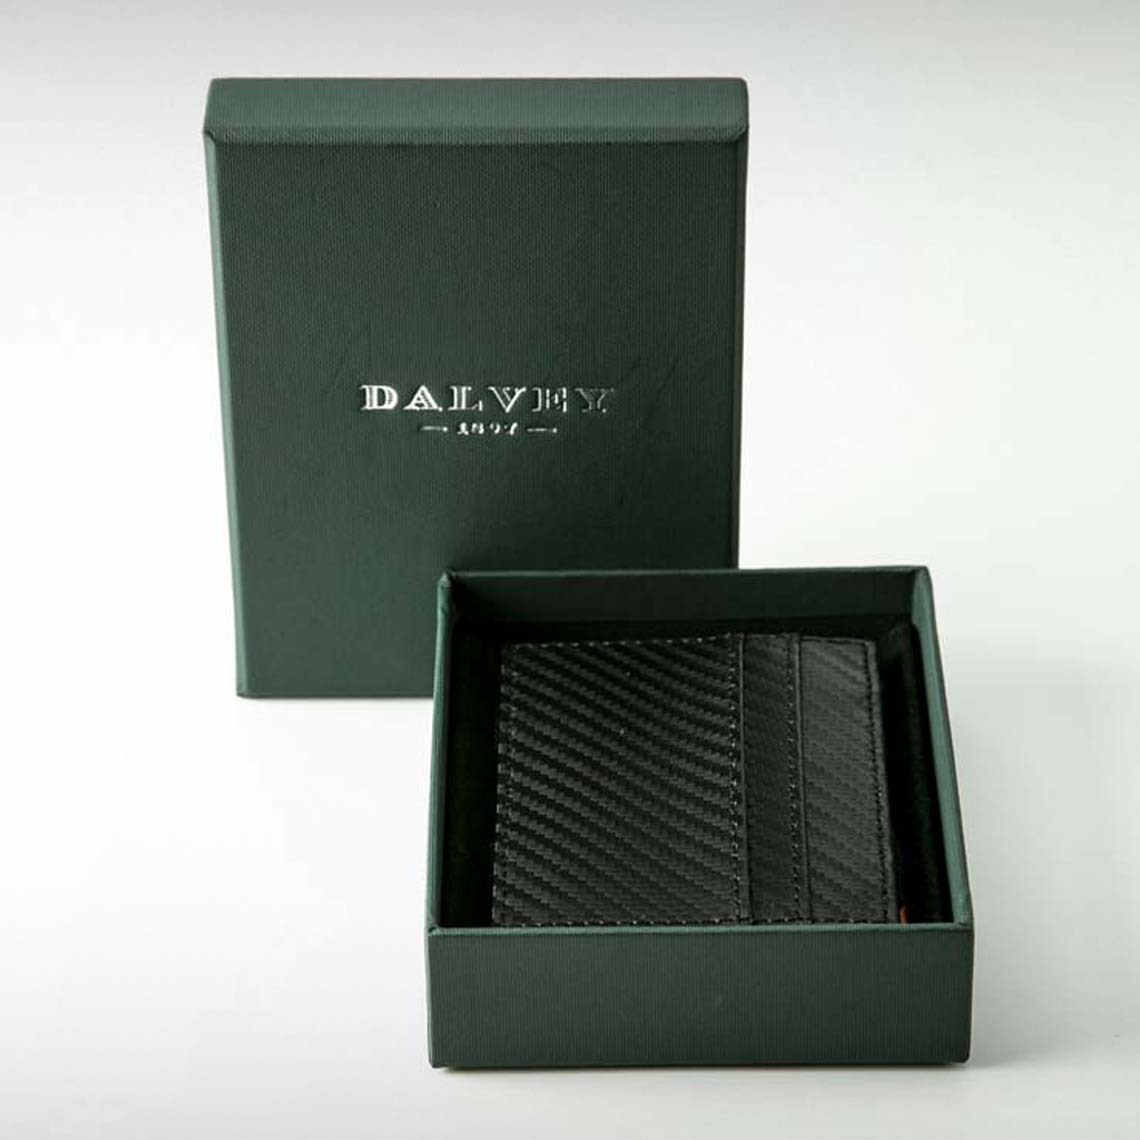 Dalvey Black Money & Card Case